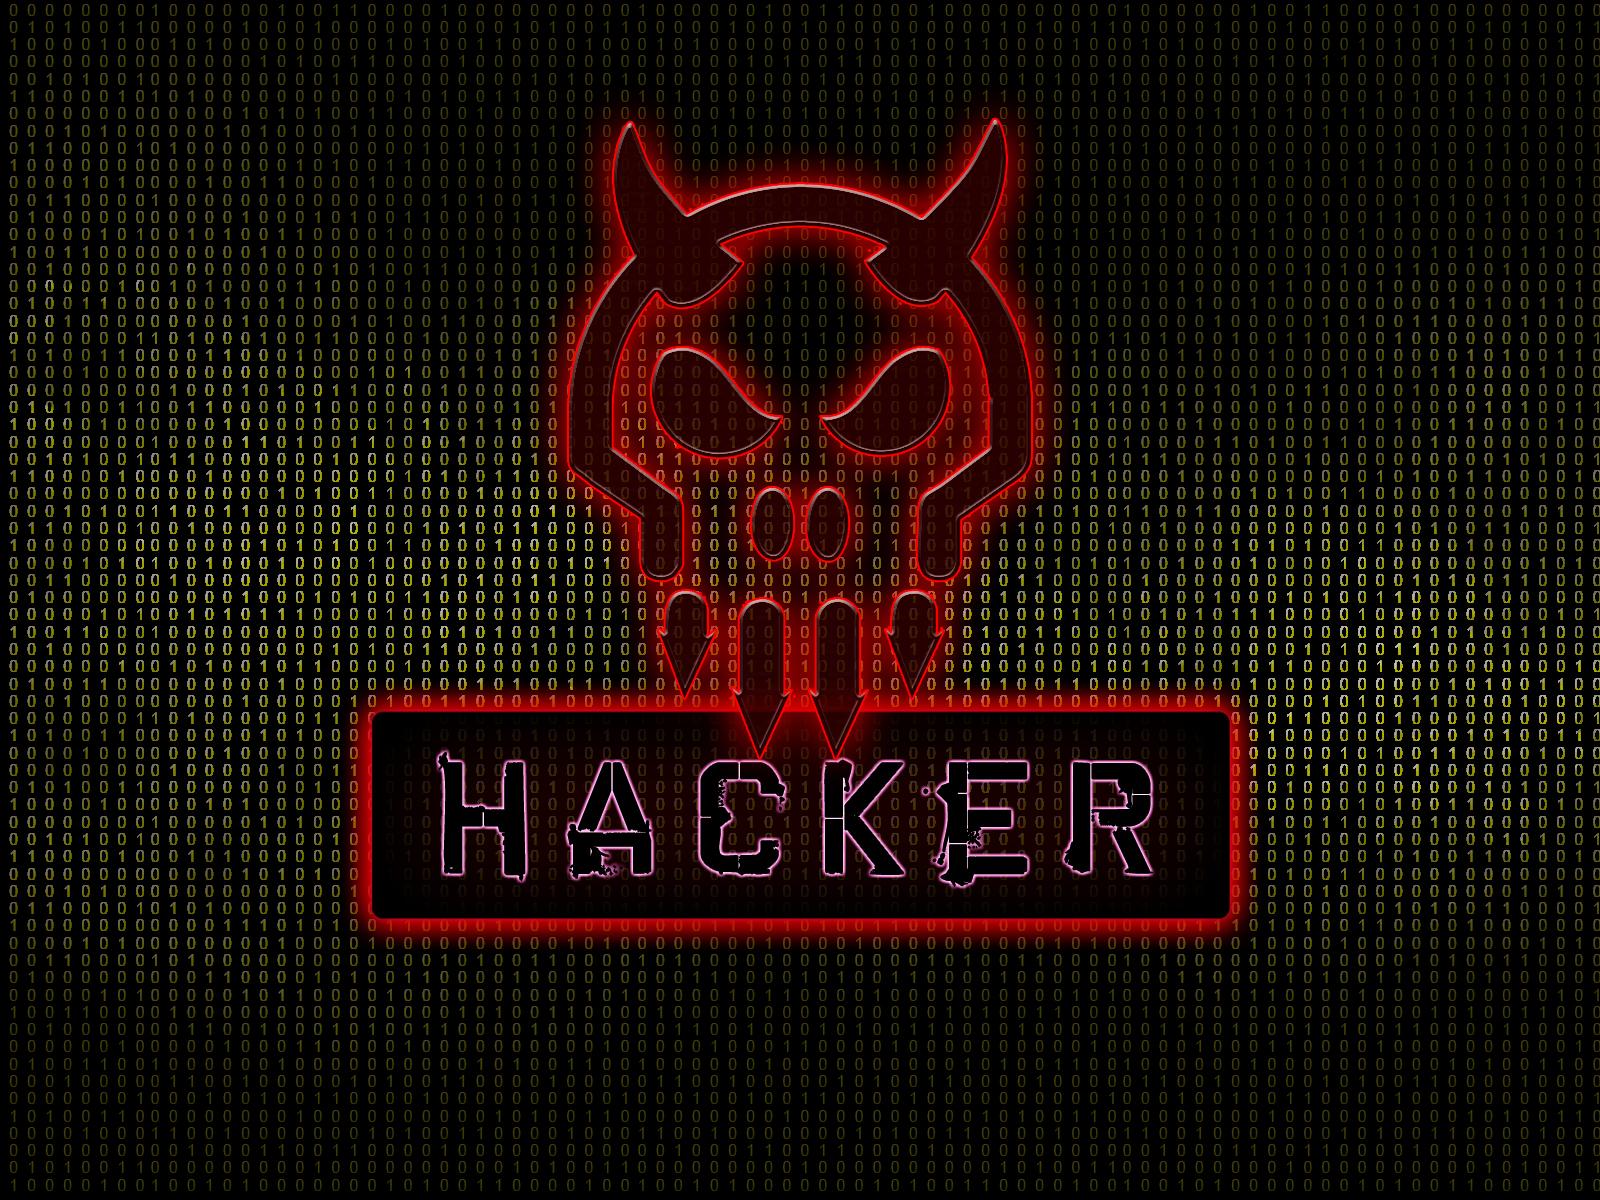 http://4.bp.blogspot.com/-o_TpiCii_vs/T4RR_qcsutI/AAAAAAAAARk/PtjYQy_-I00/s1600/Hacker_Wallpaper_by_DjStyfler.jpg